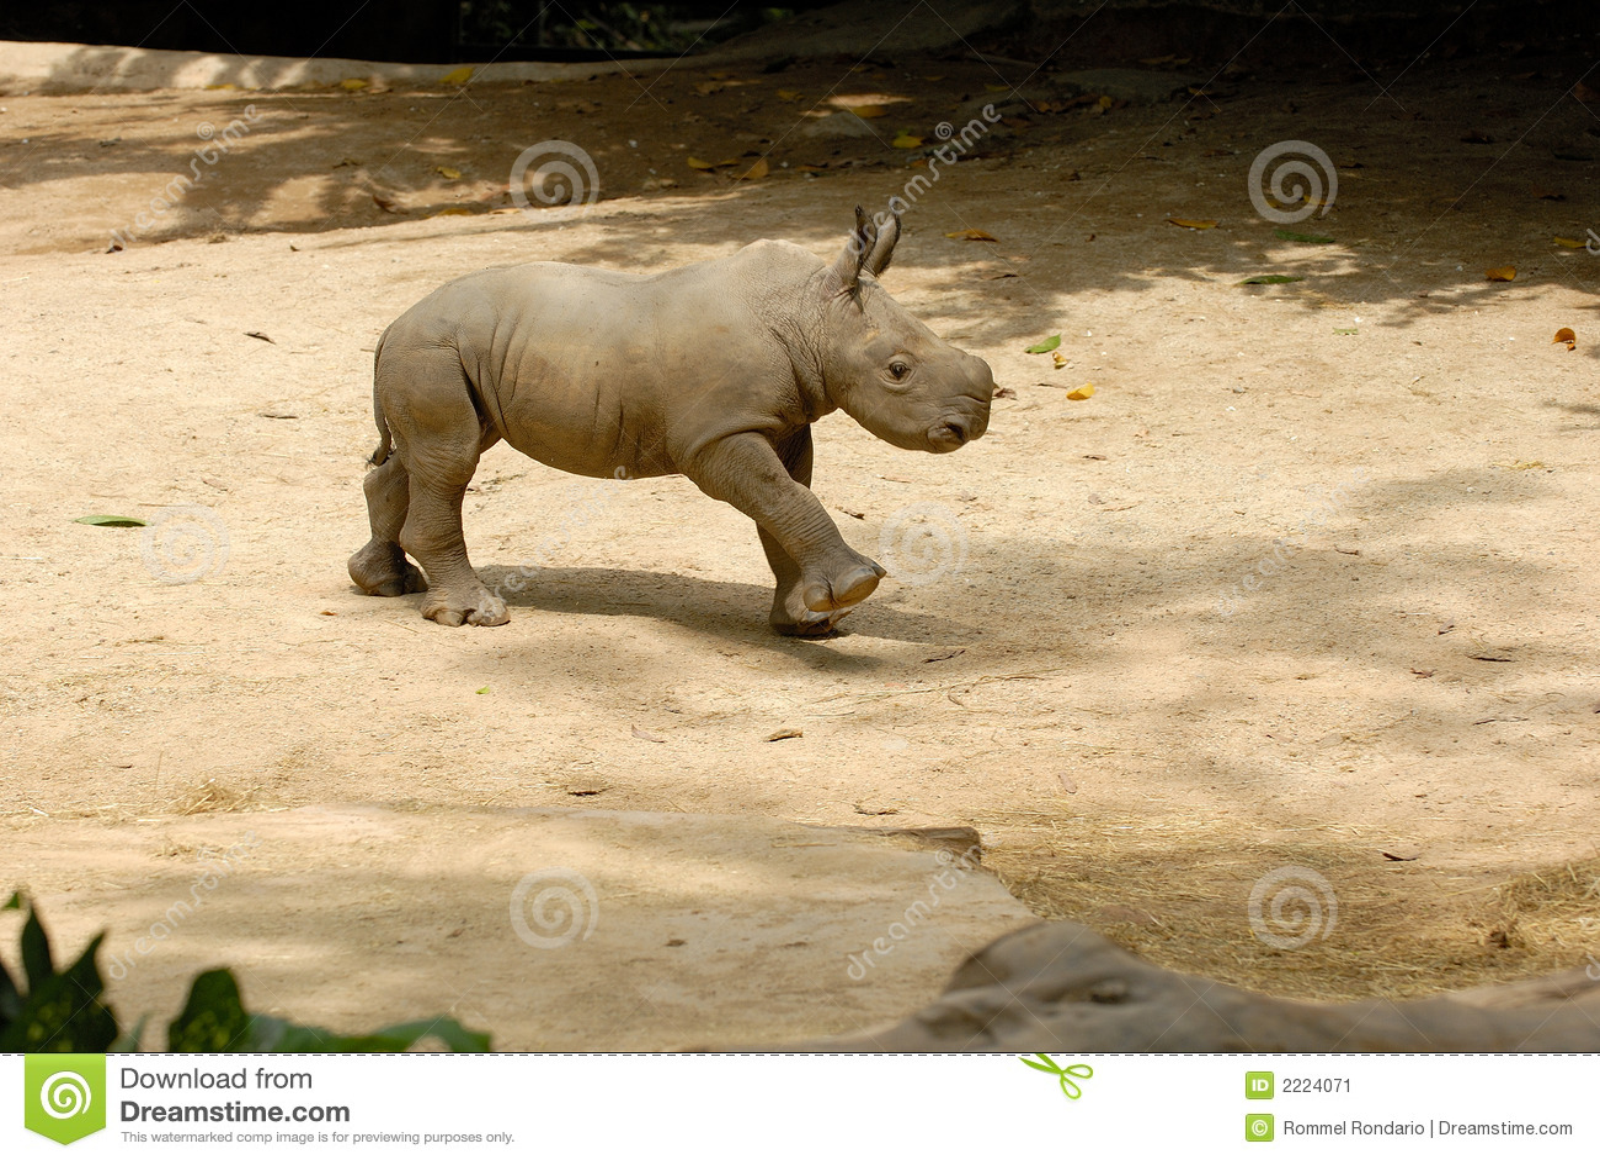 Rhinocéros de chéri